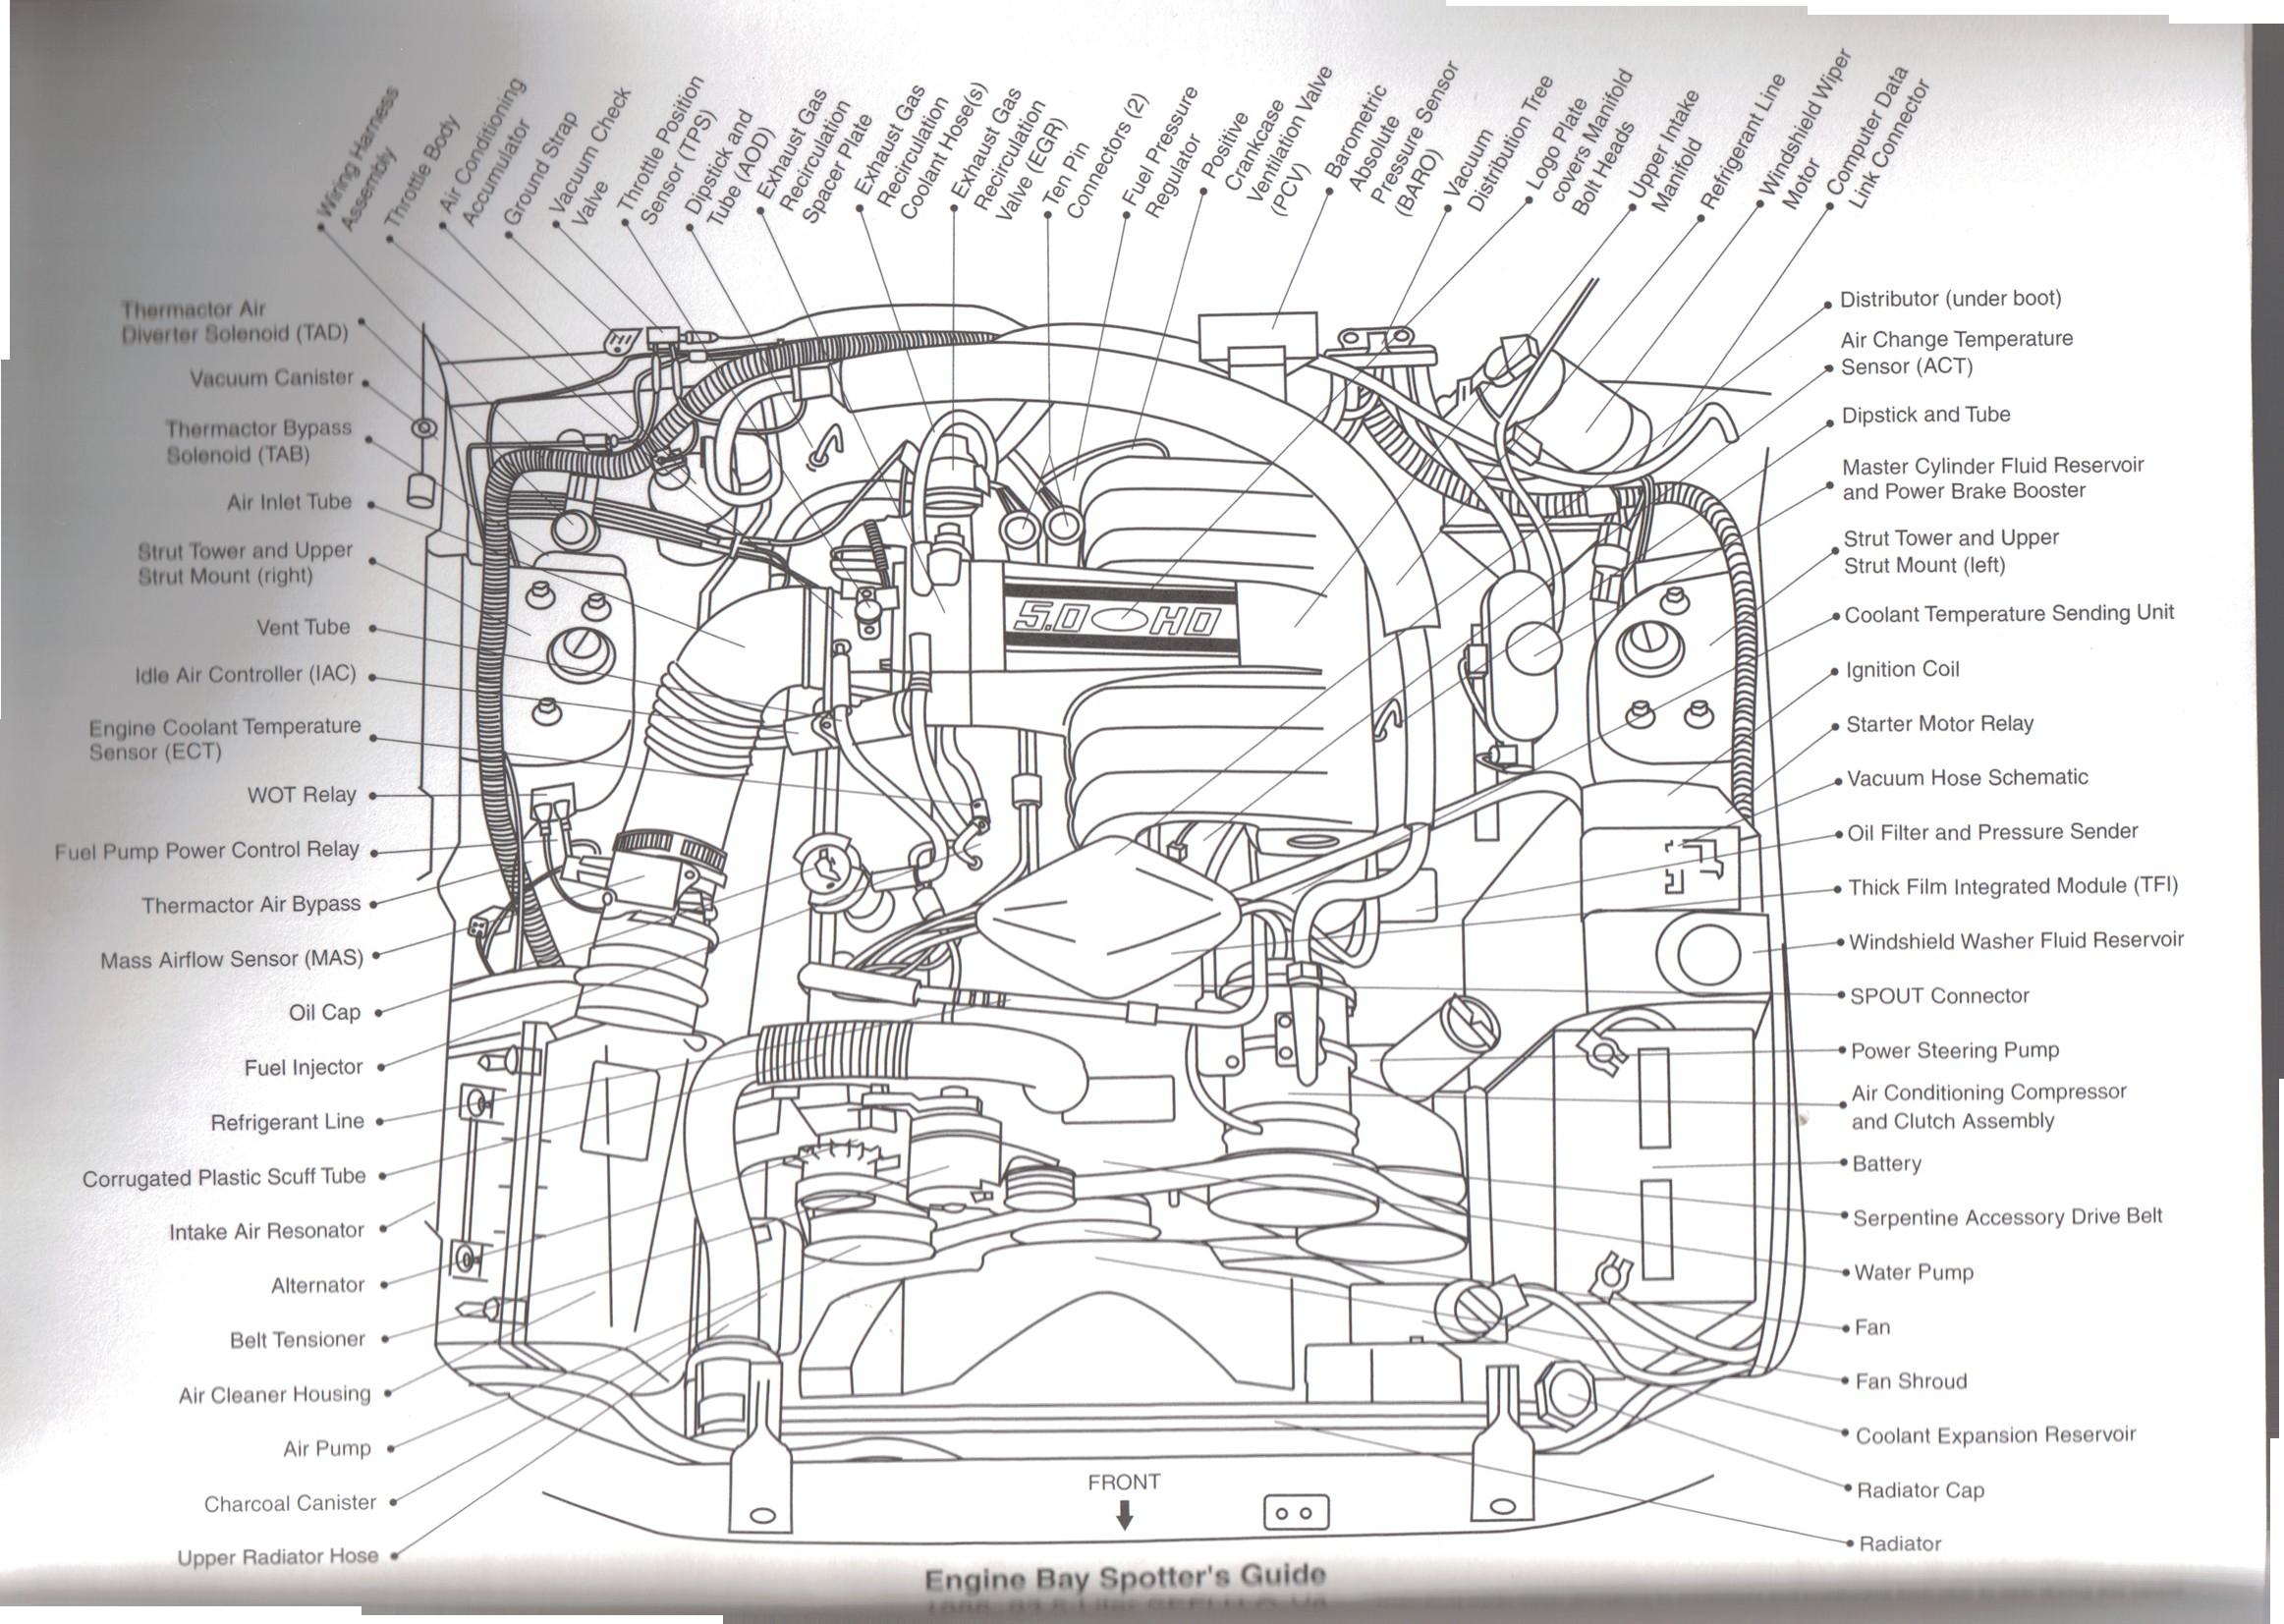 1992 ford f150 parts diagram 1990 ford f 150 wiring diagram wiring rh detoxicrecenze com Ford 302 Engine Wiring Diagrams Official Ford 302 Engine Diagram